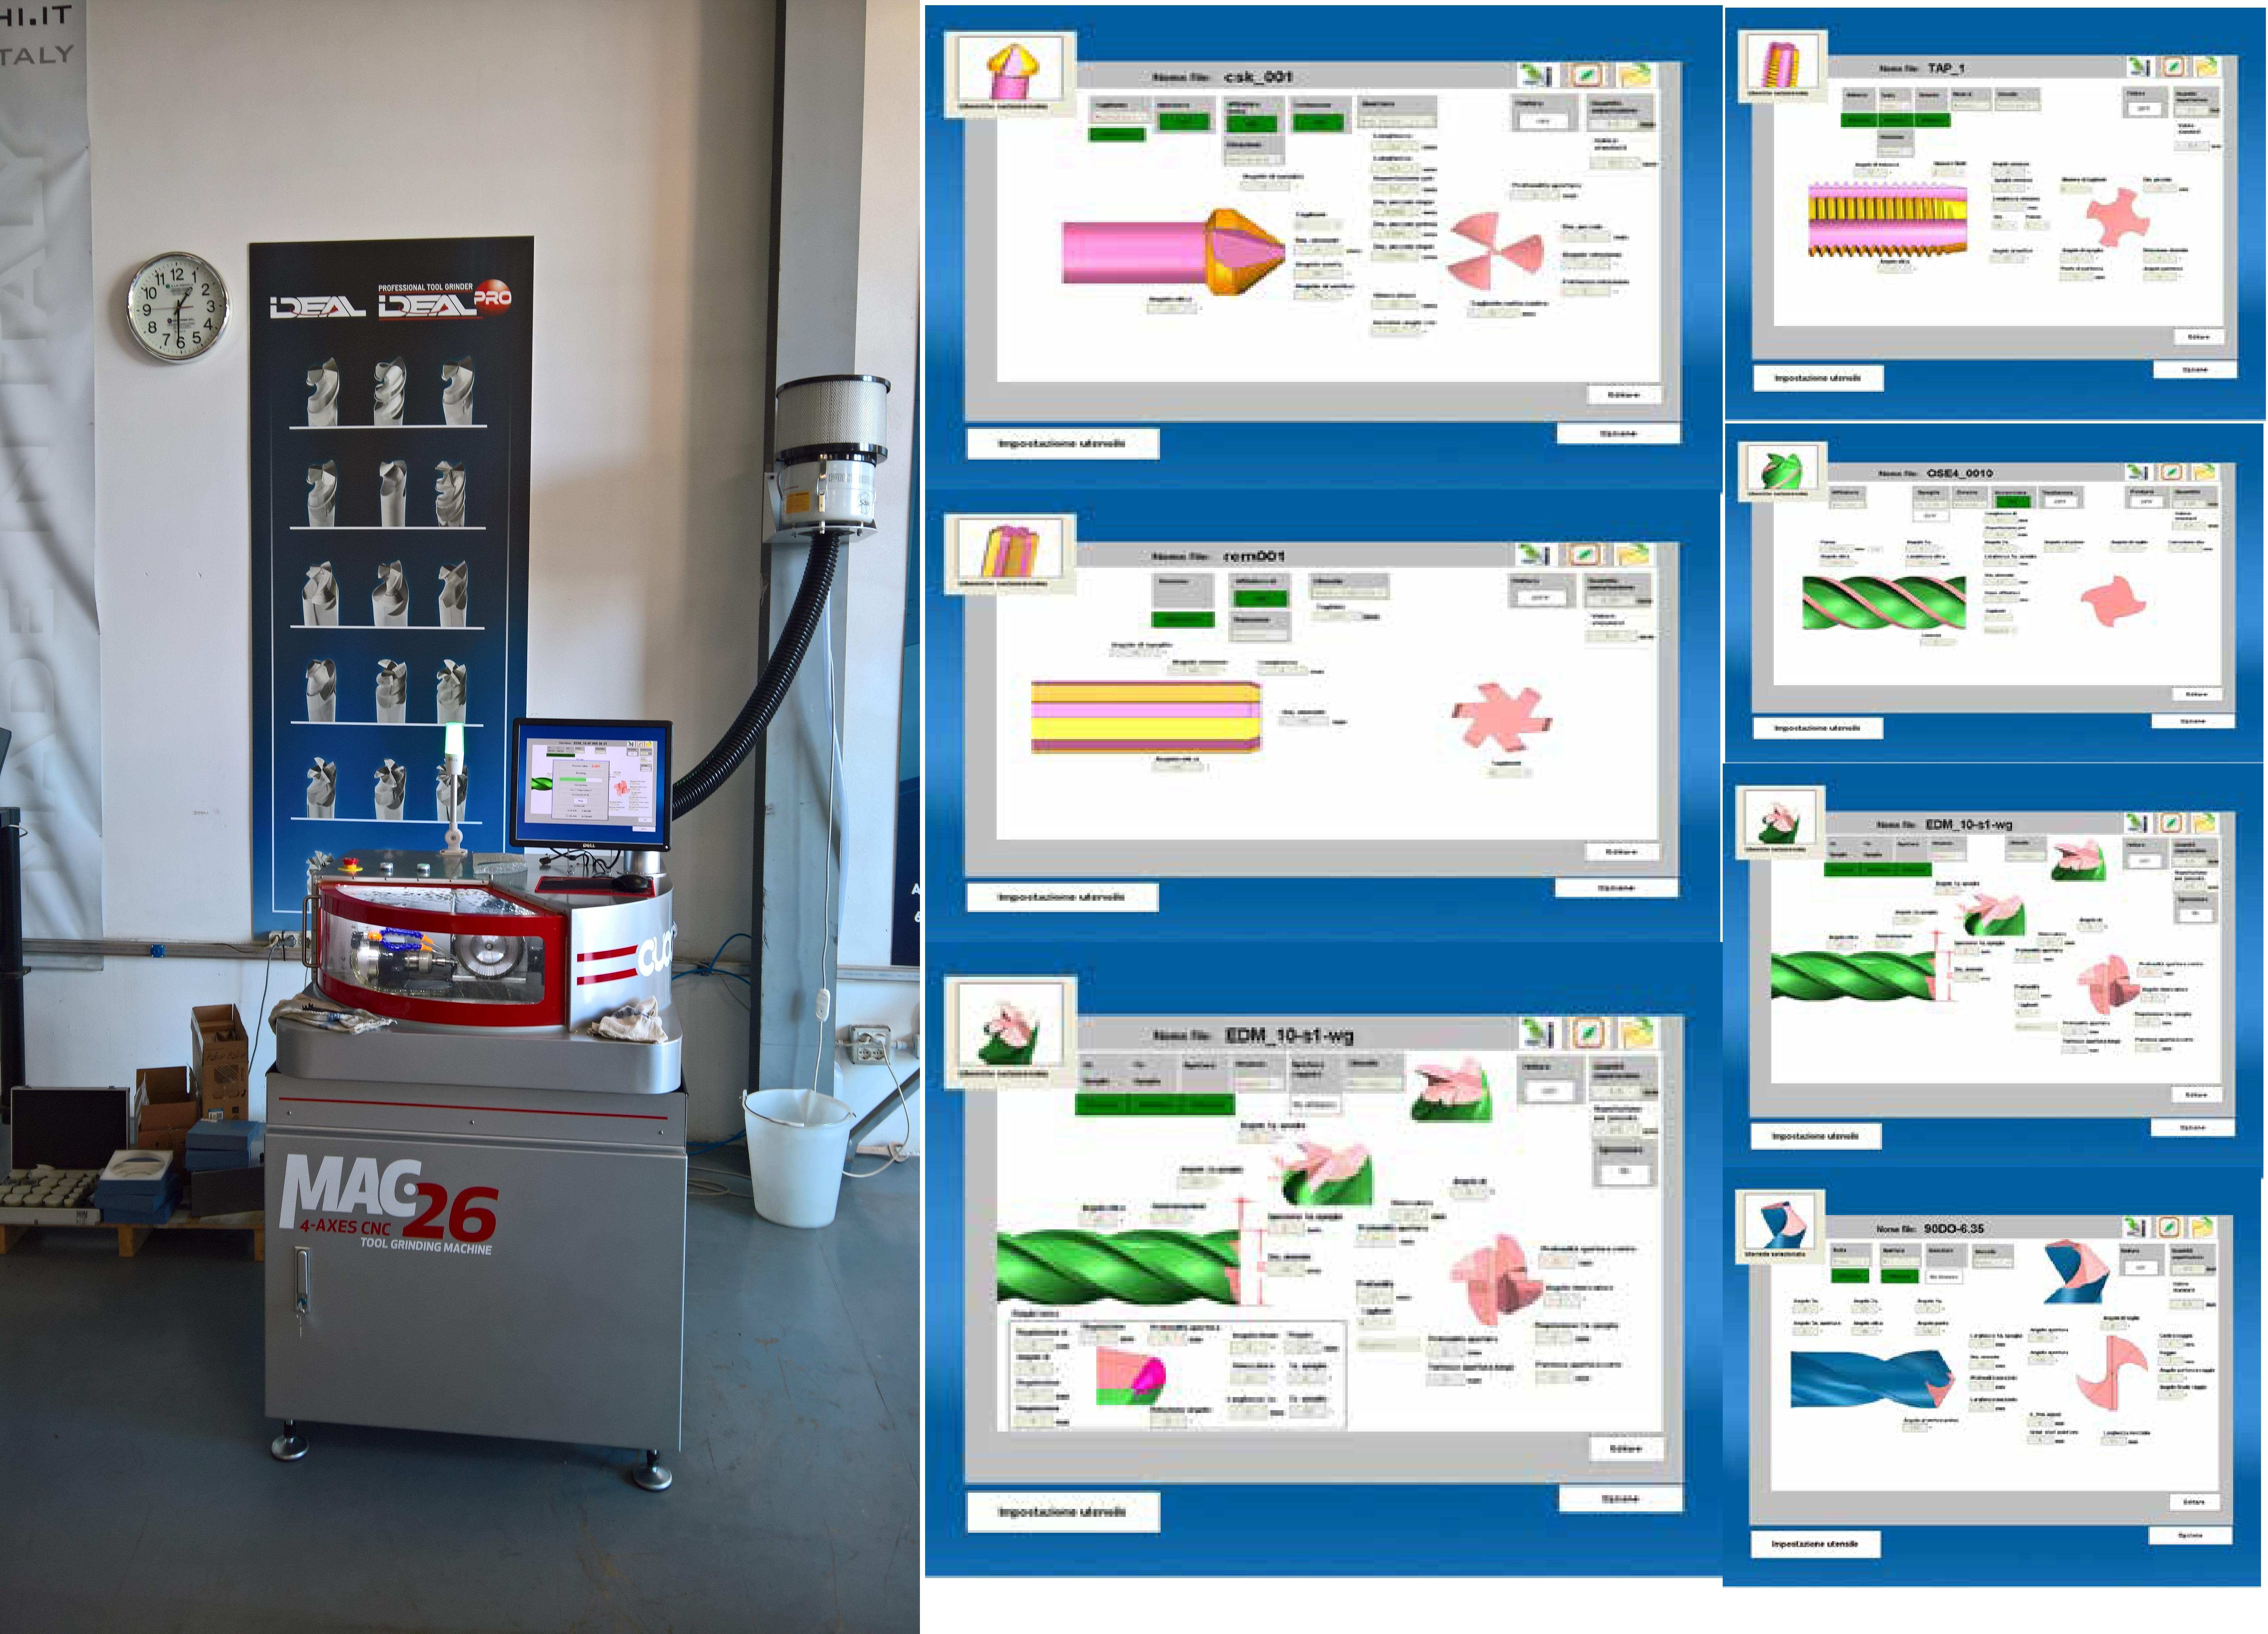 MAC 26 tool regrinding machine